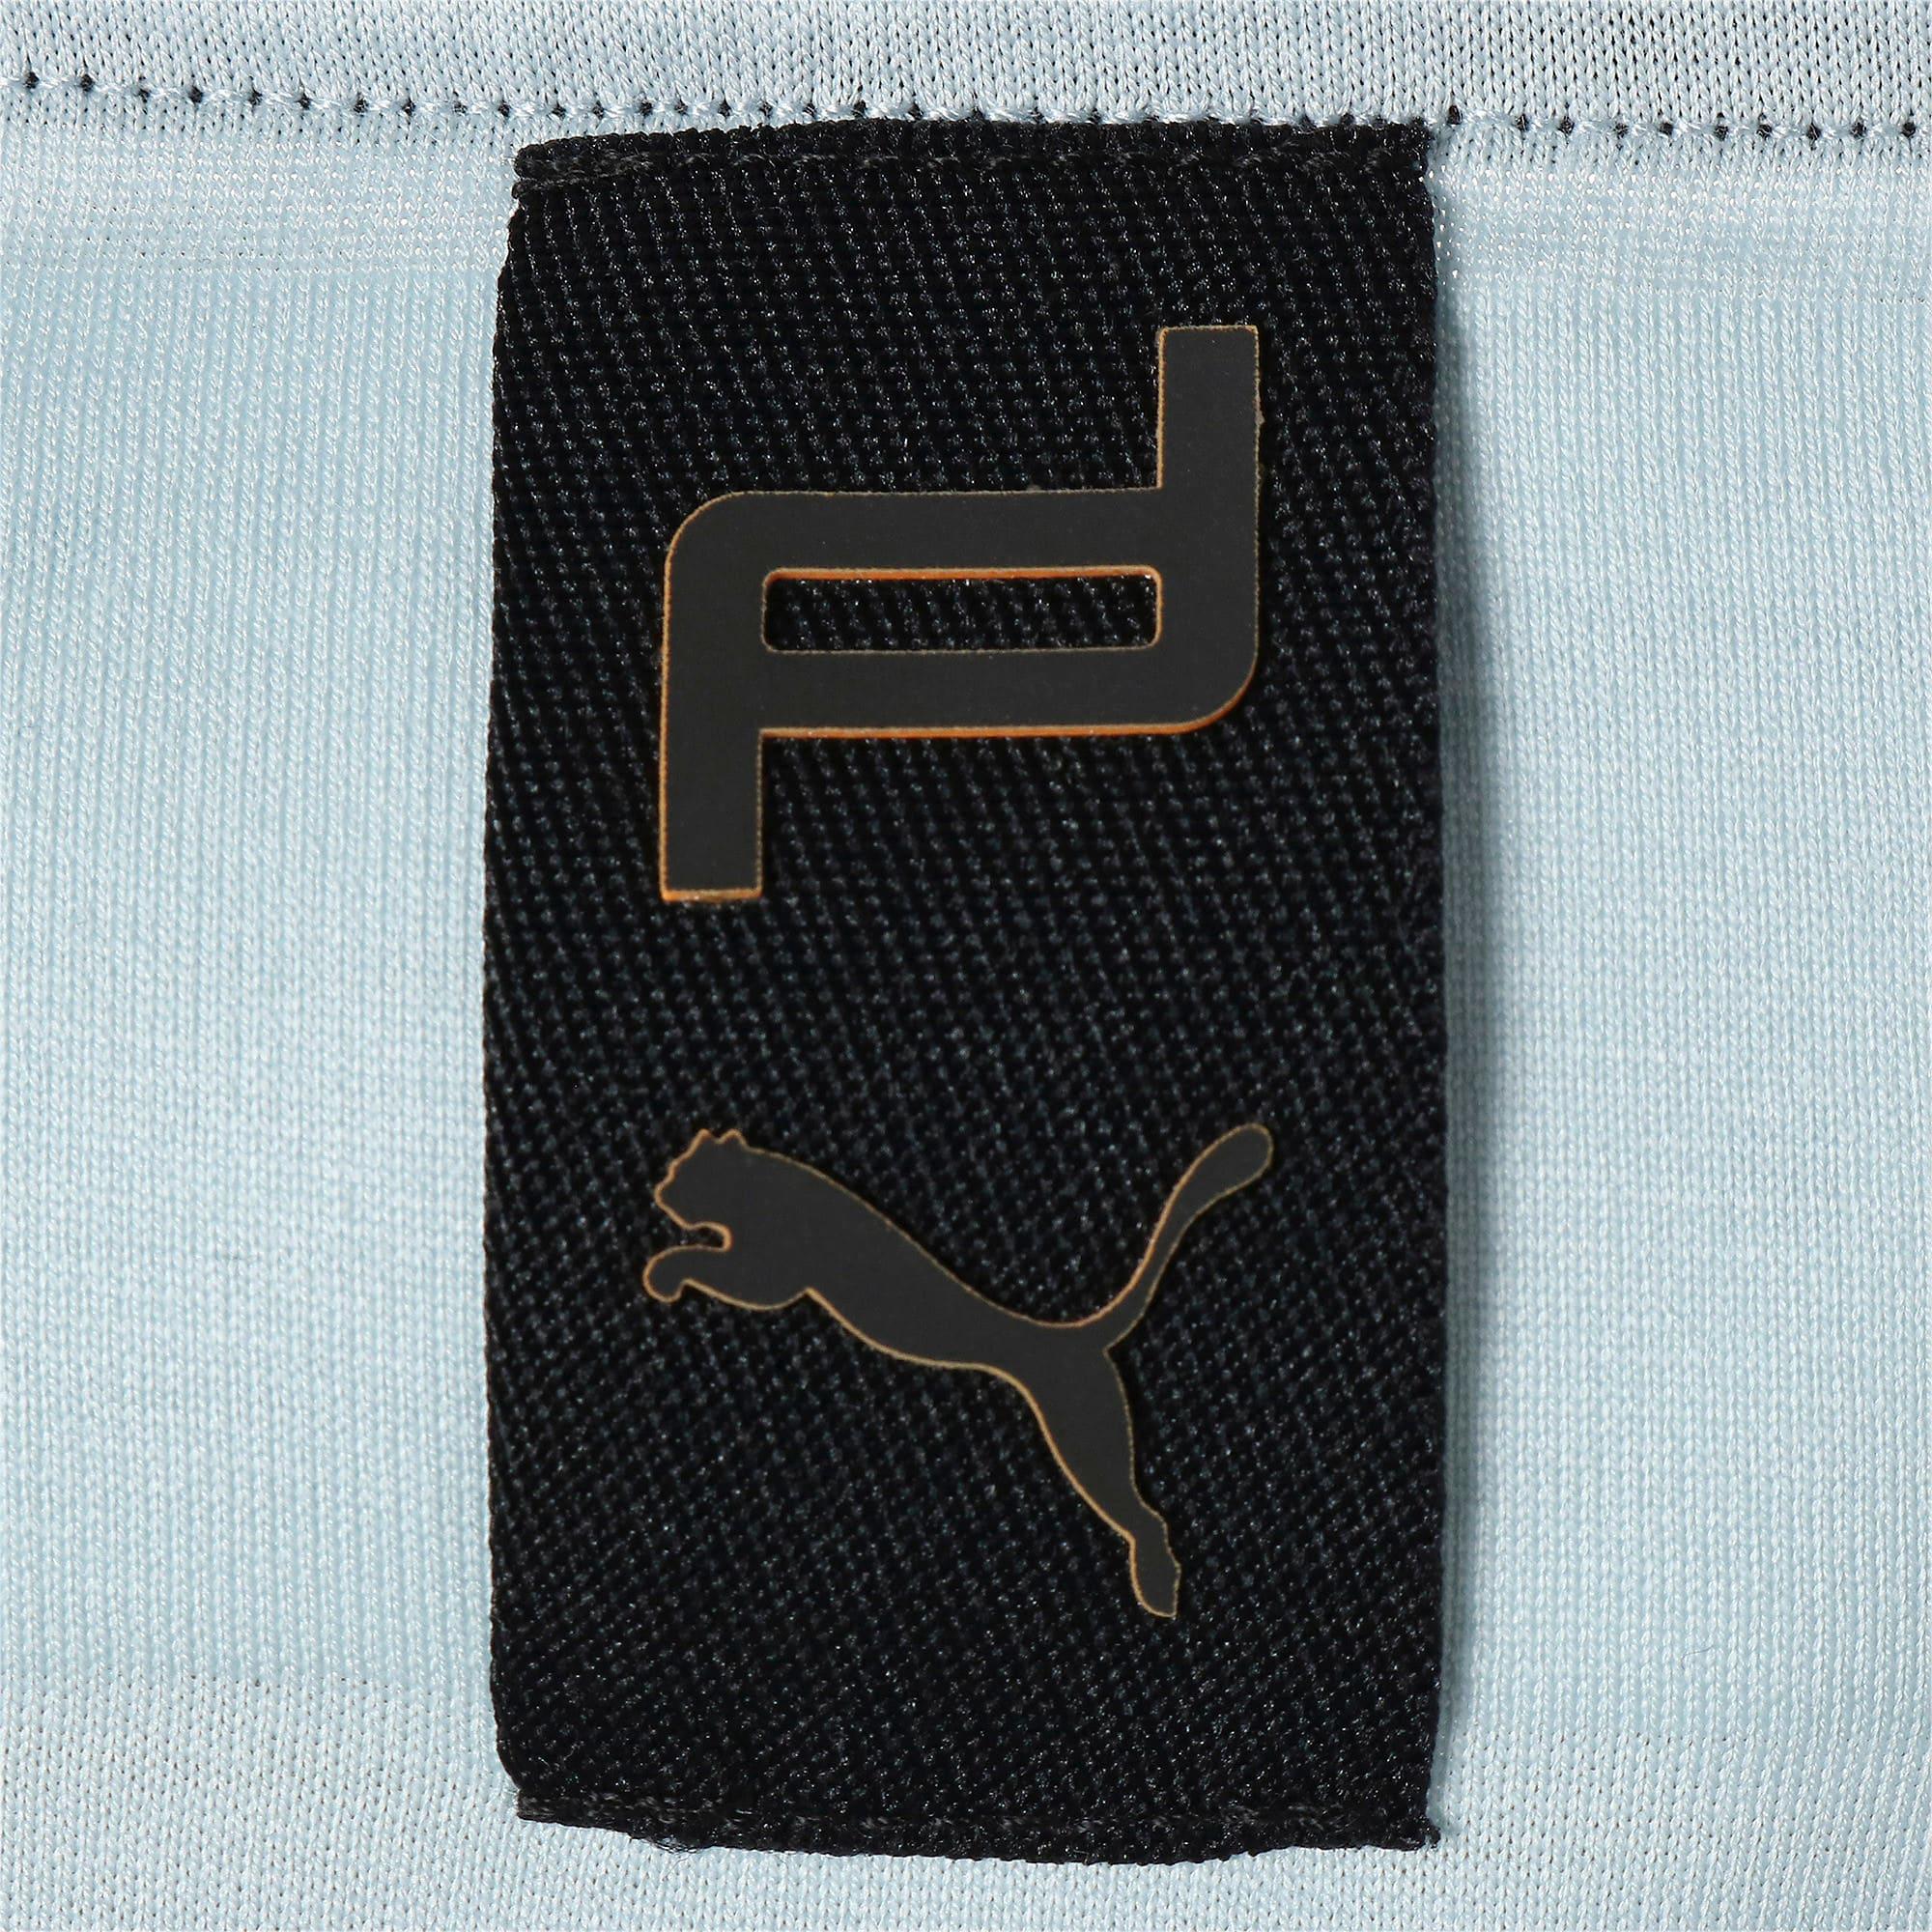 Thumbnail 7 of PORSCHE DESIGN  グラフィック Tシャツ, Light Sky, medium-JPN